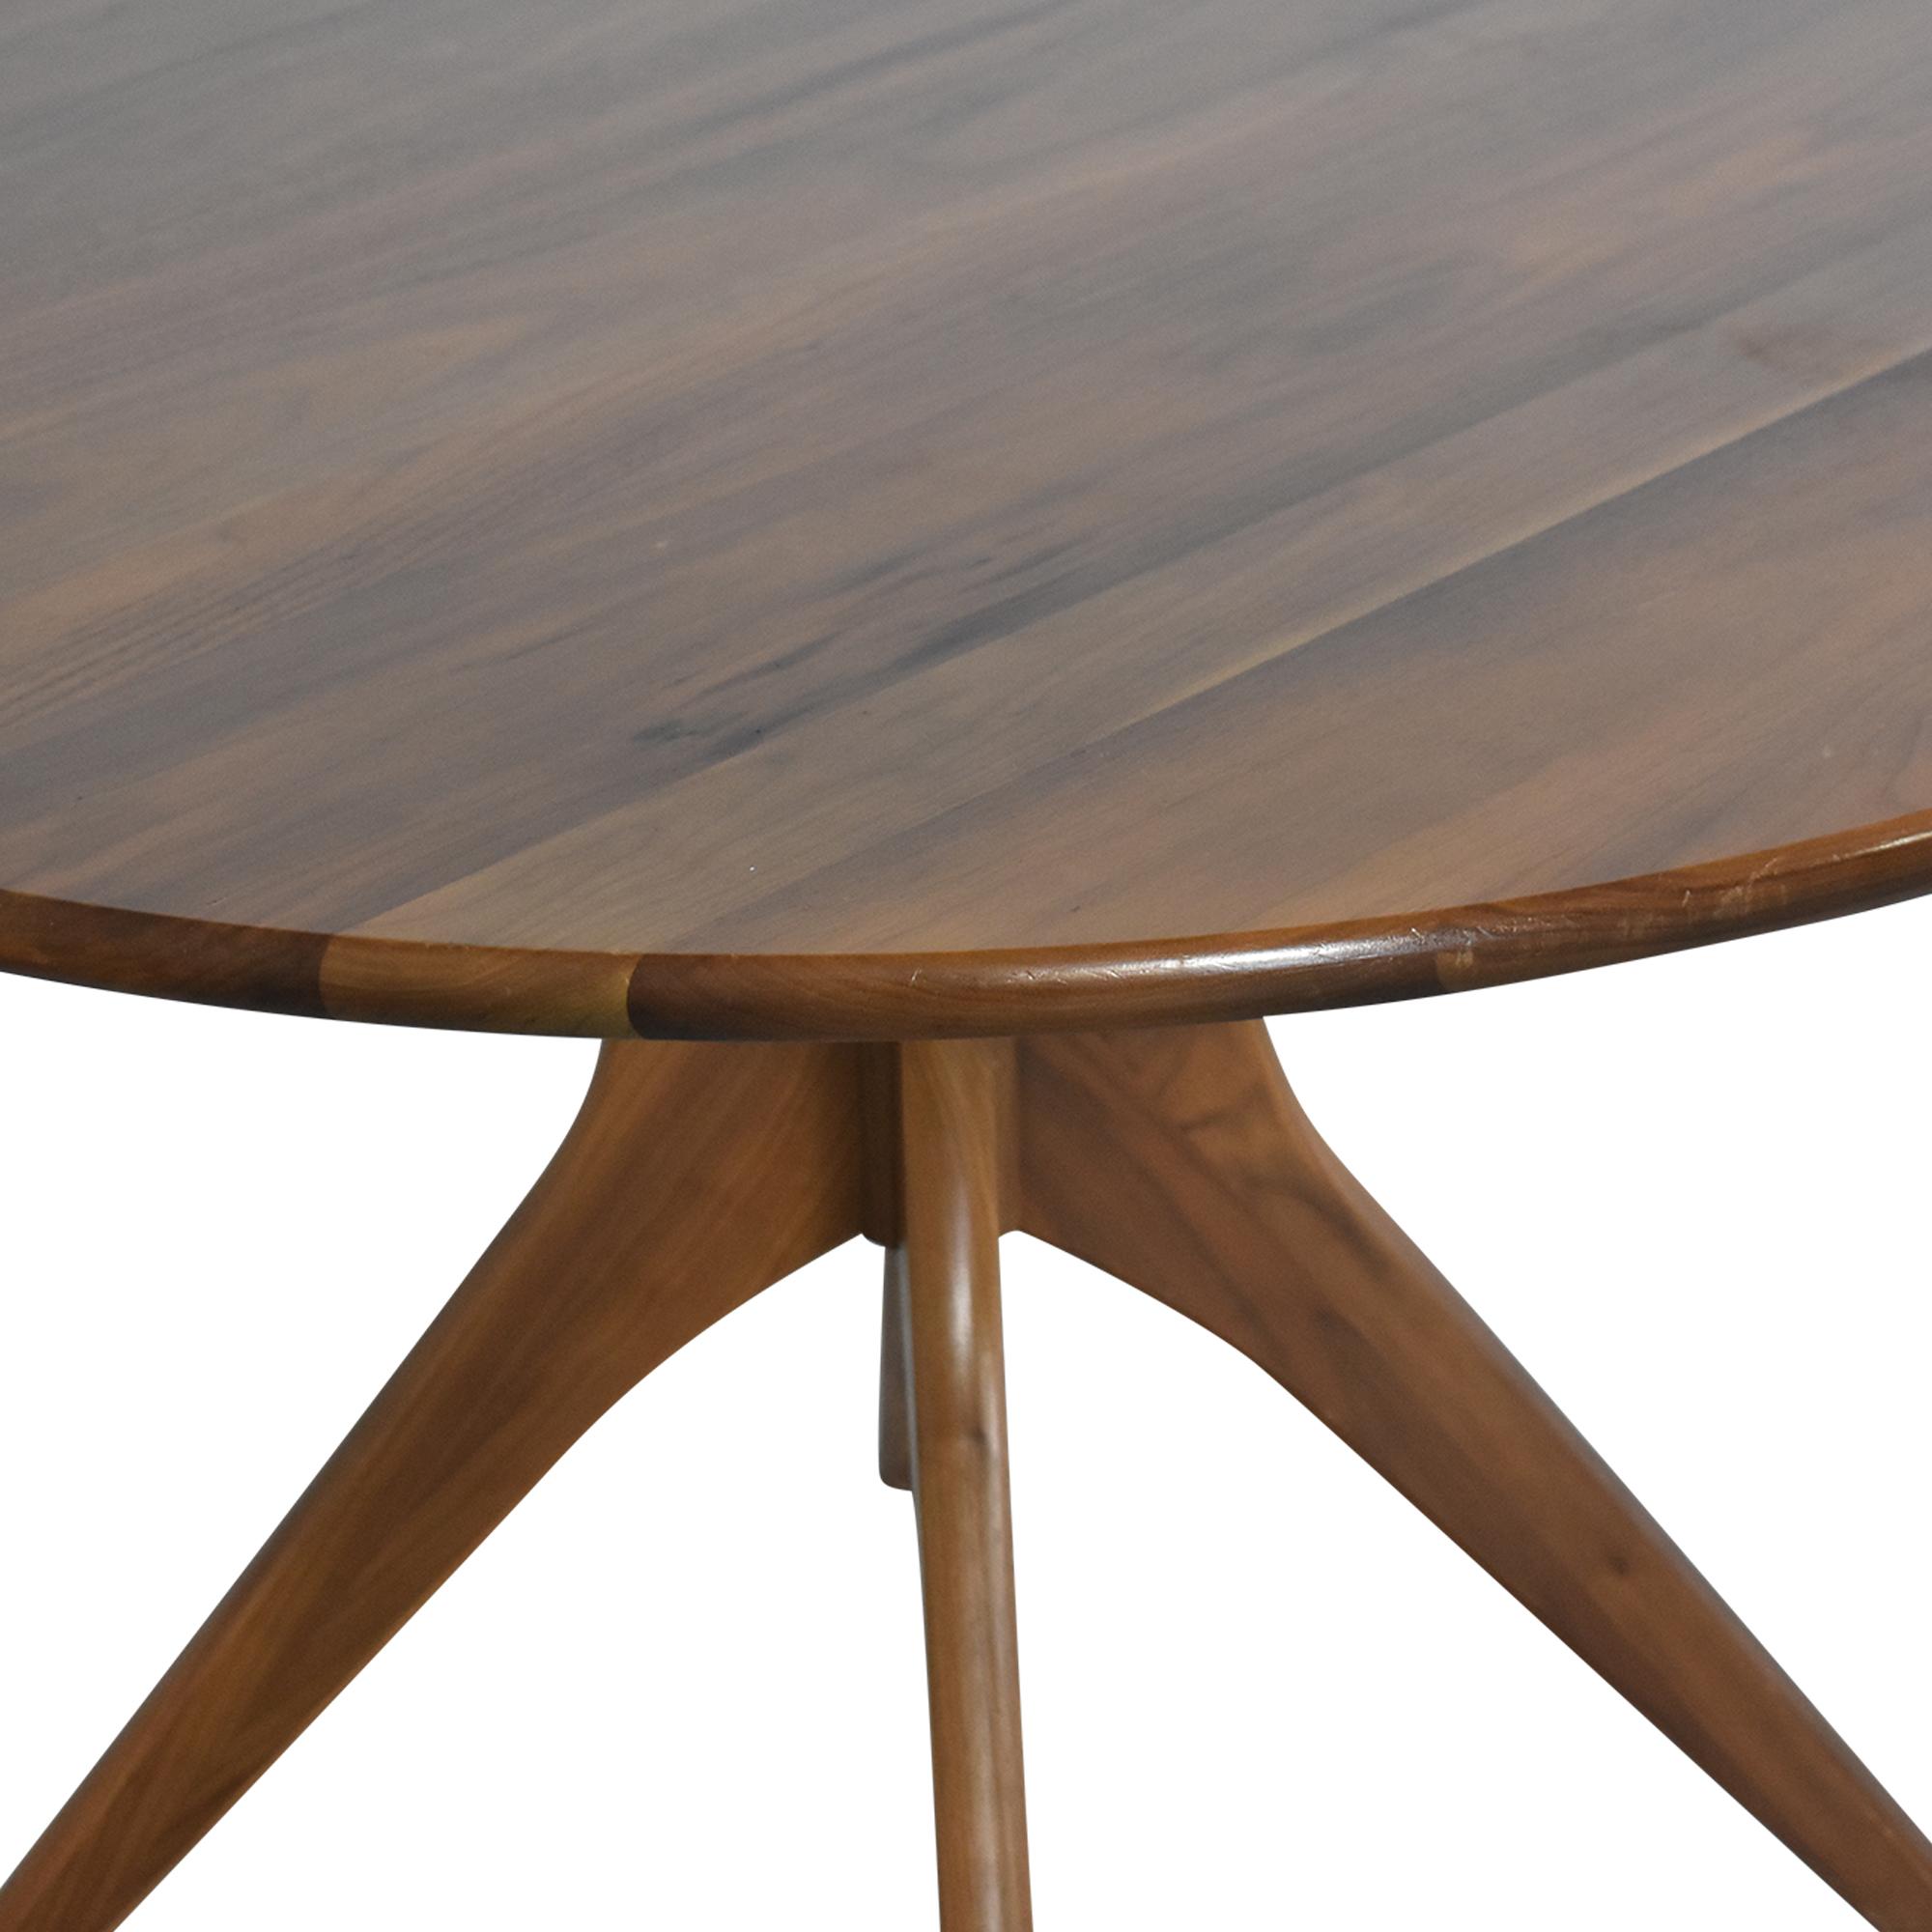 Room & Board Room & Board Round Table dimensions